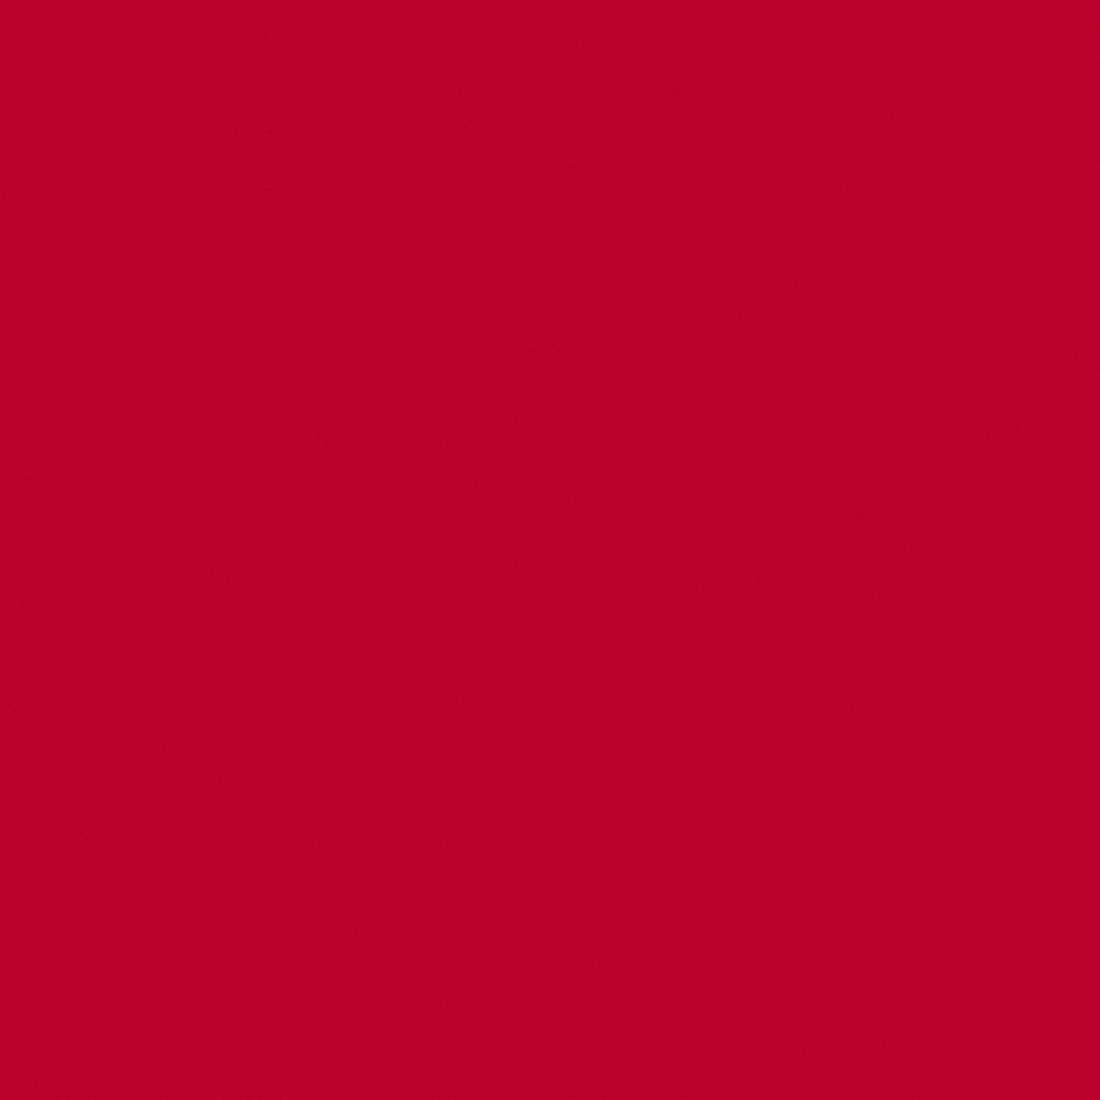 Dekor-Chilli-rot